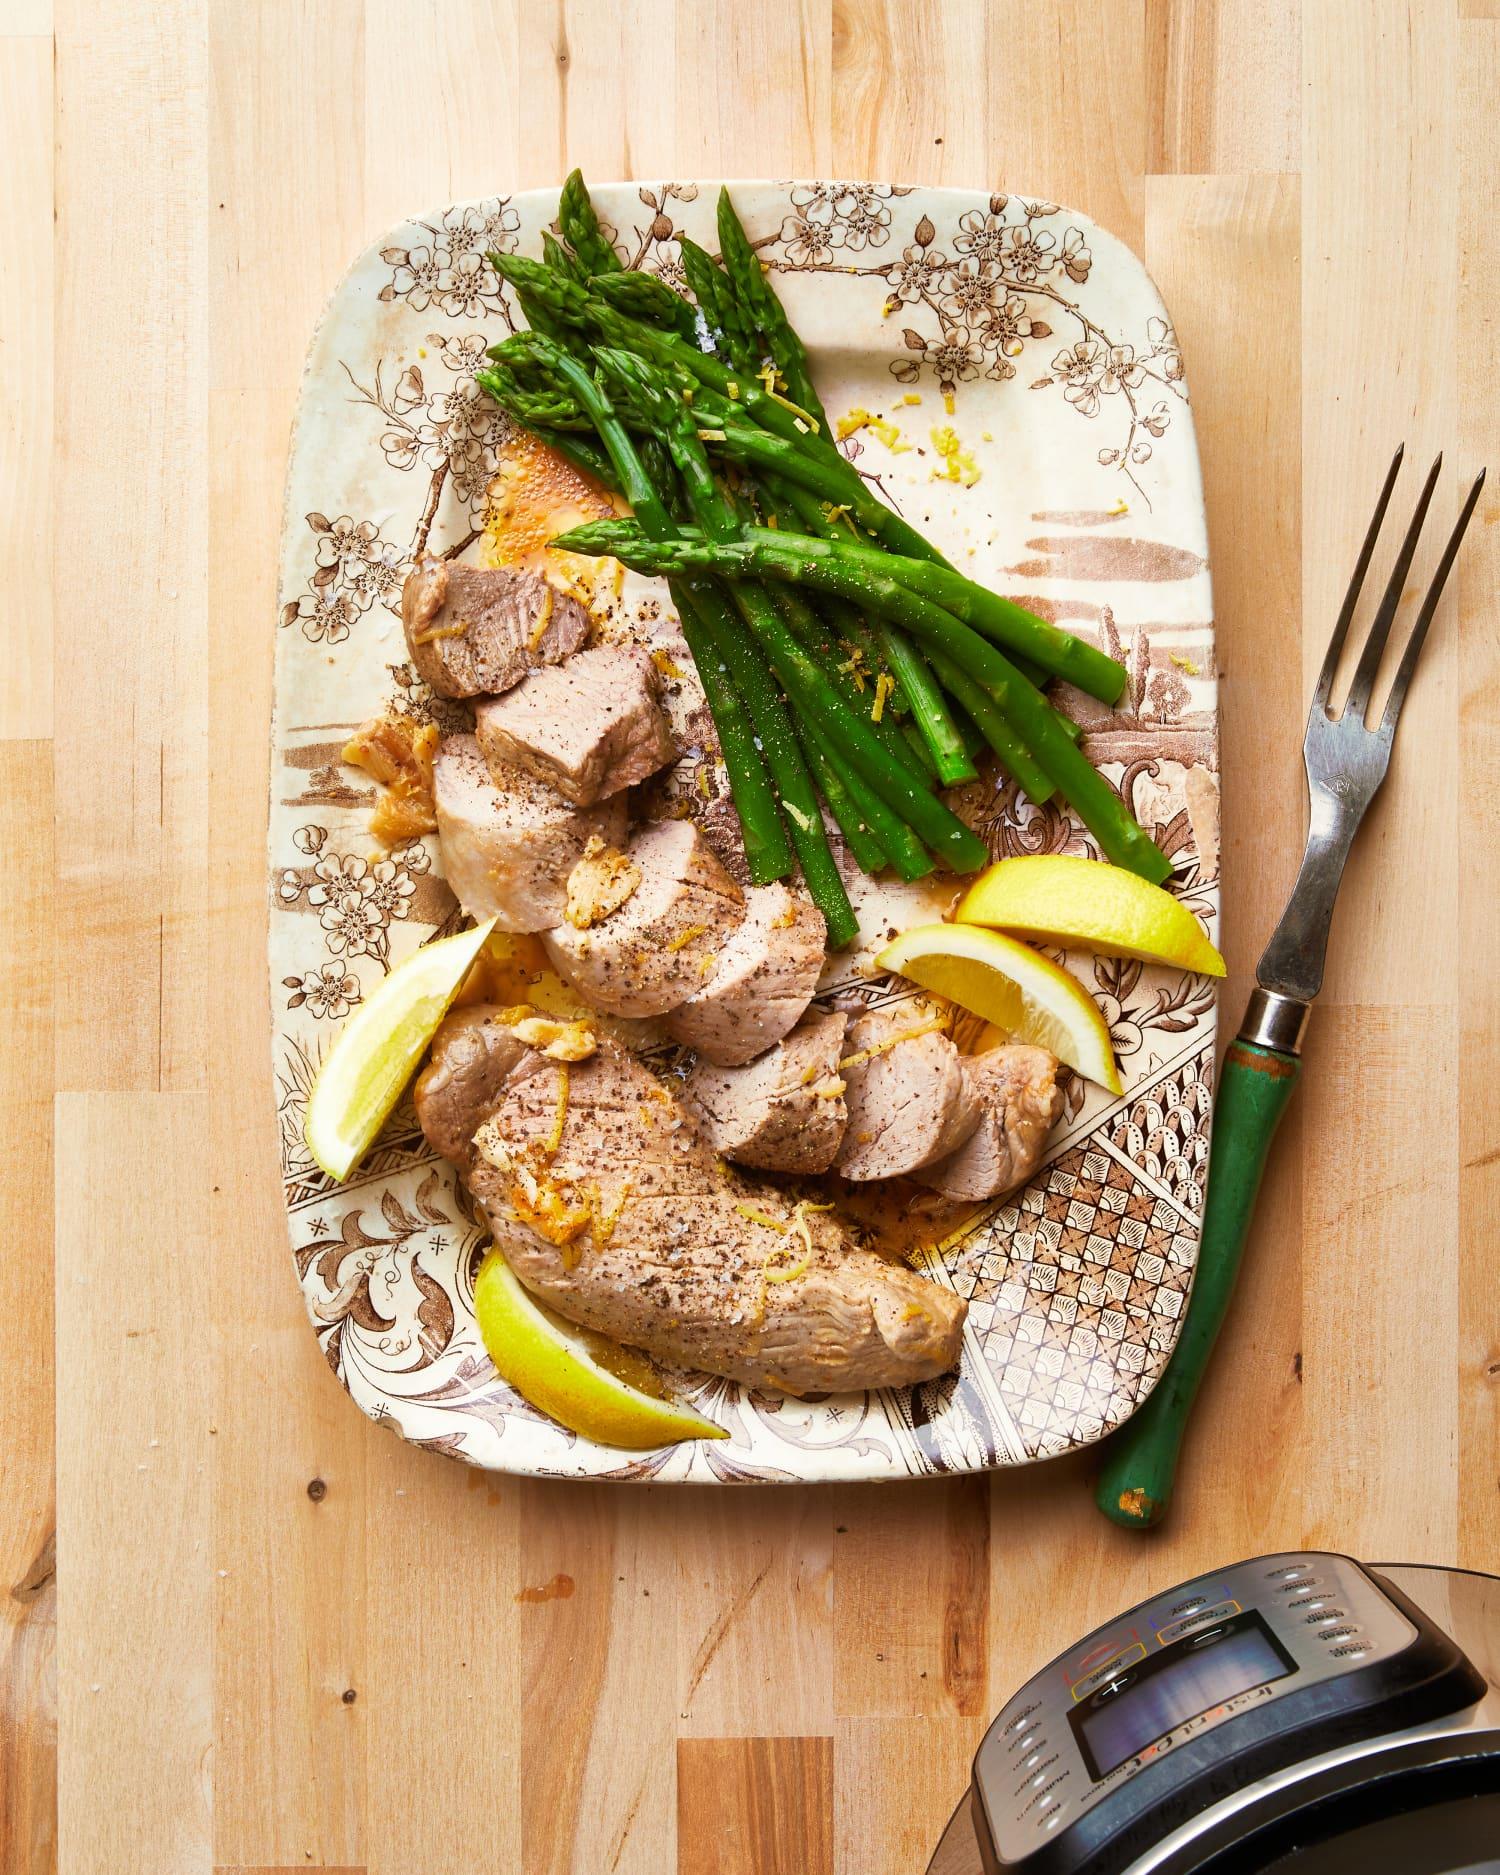 Instant Pot Lemon Garlic Butter Pork Tenderloin Is Tender, Juicy Perfection